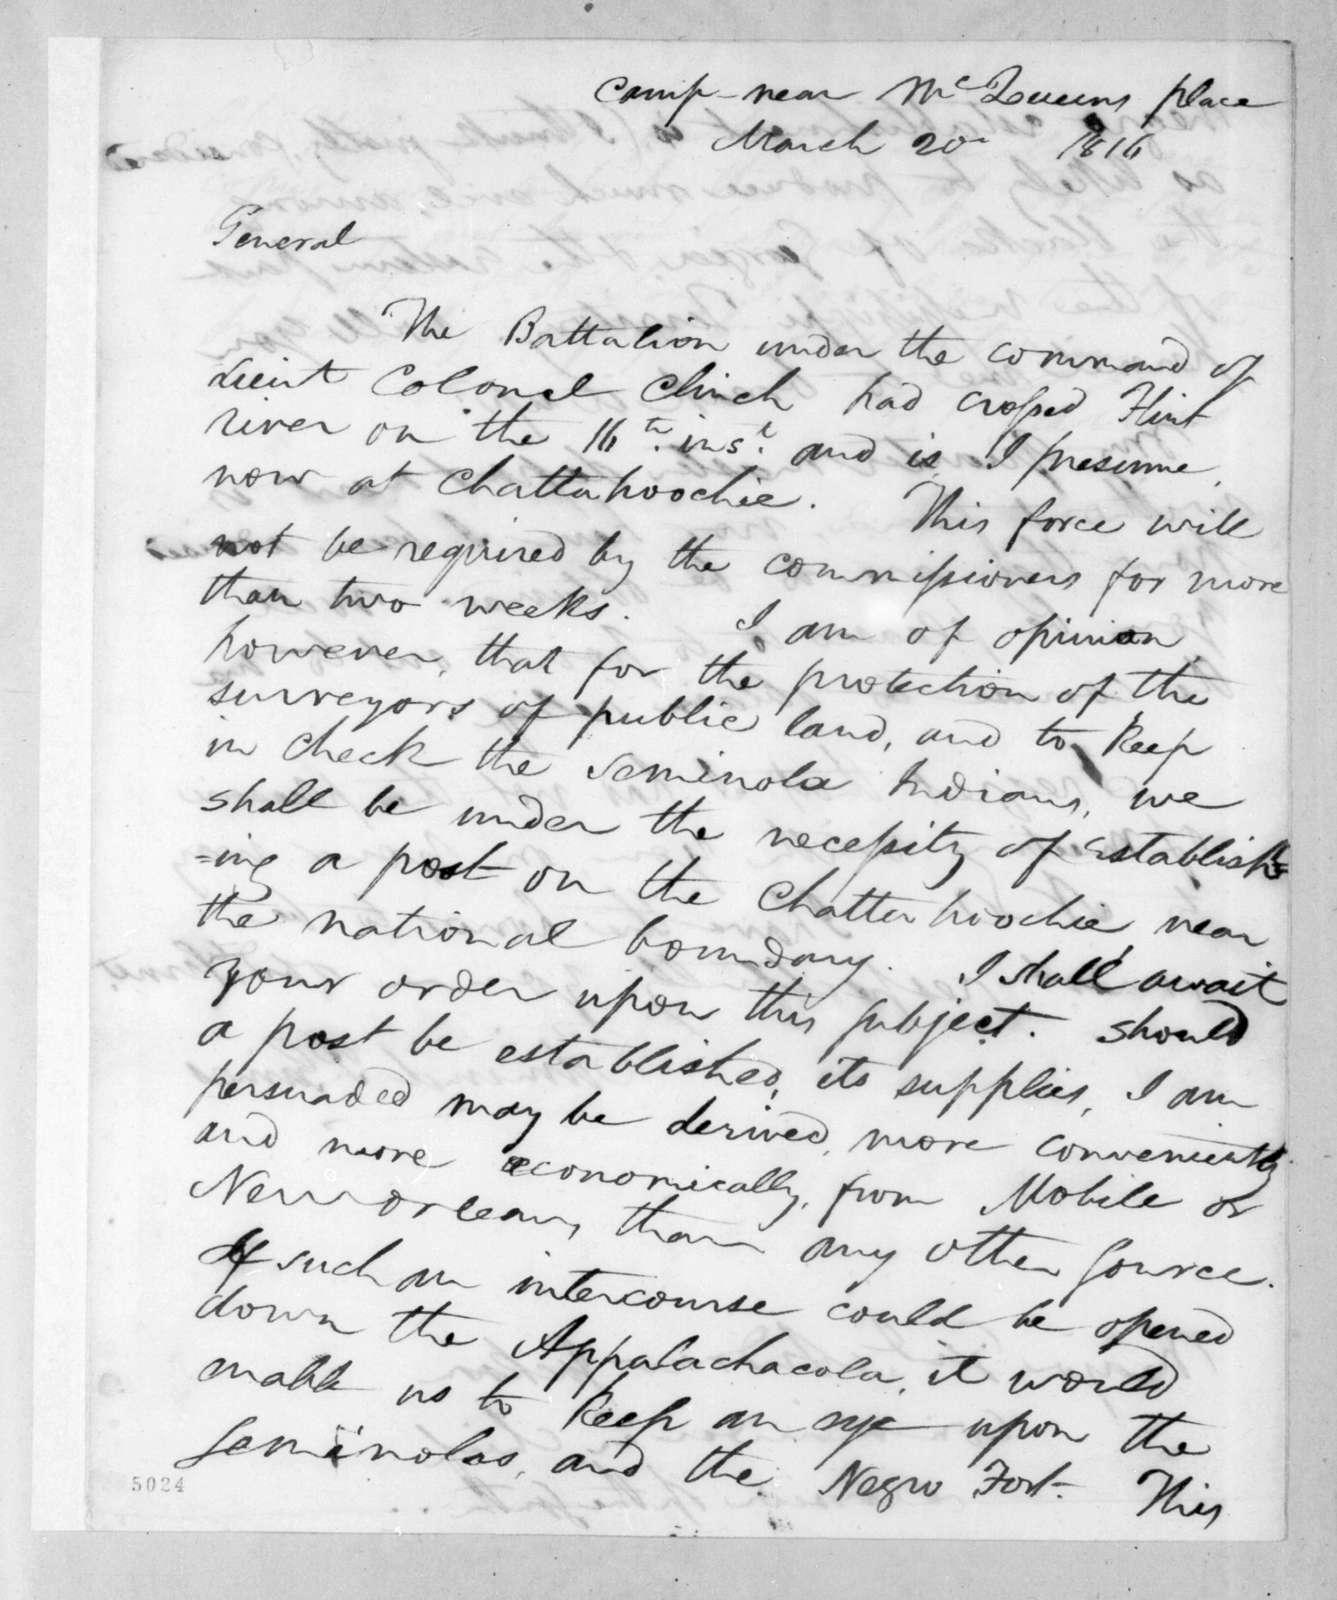 Edmund Pendleton Gaines to Andrew Jackson, March 20, 1816